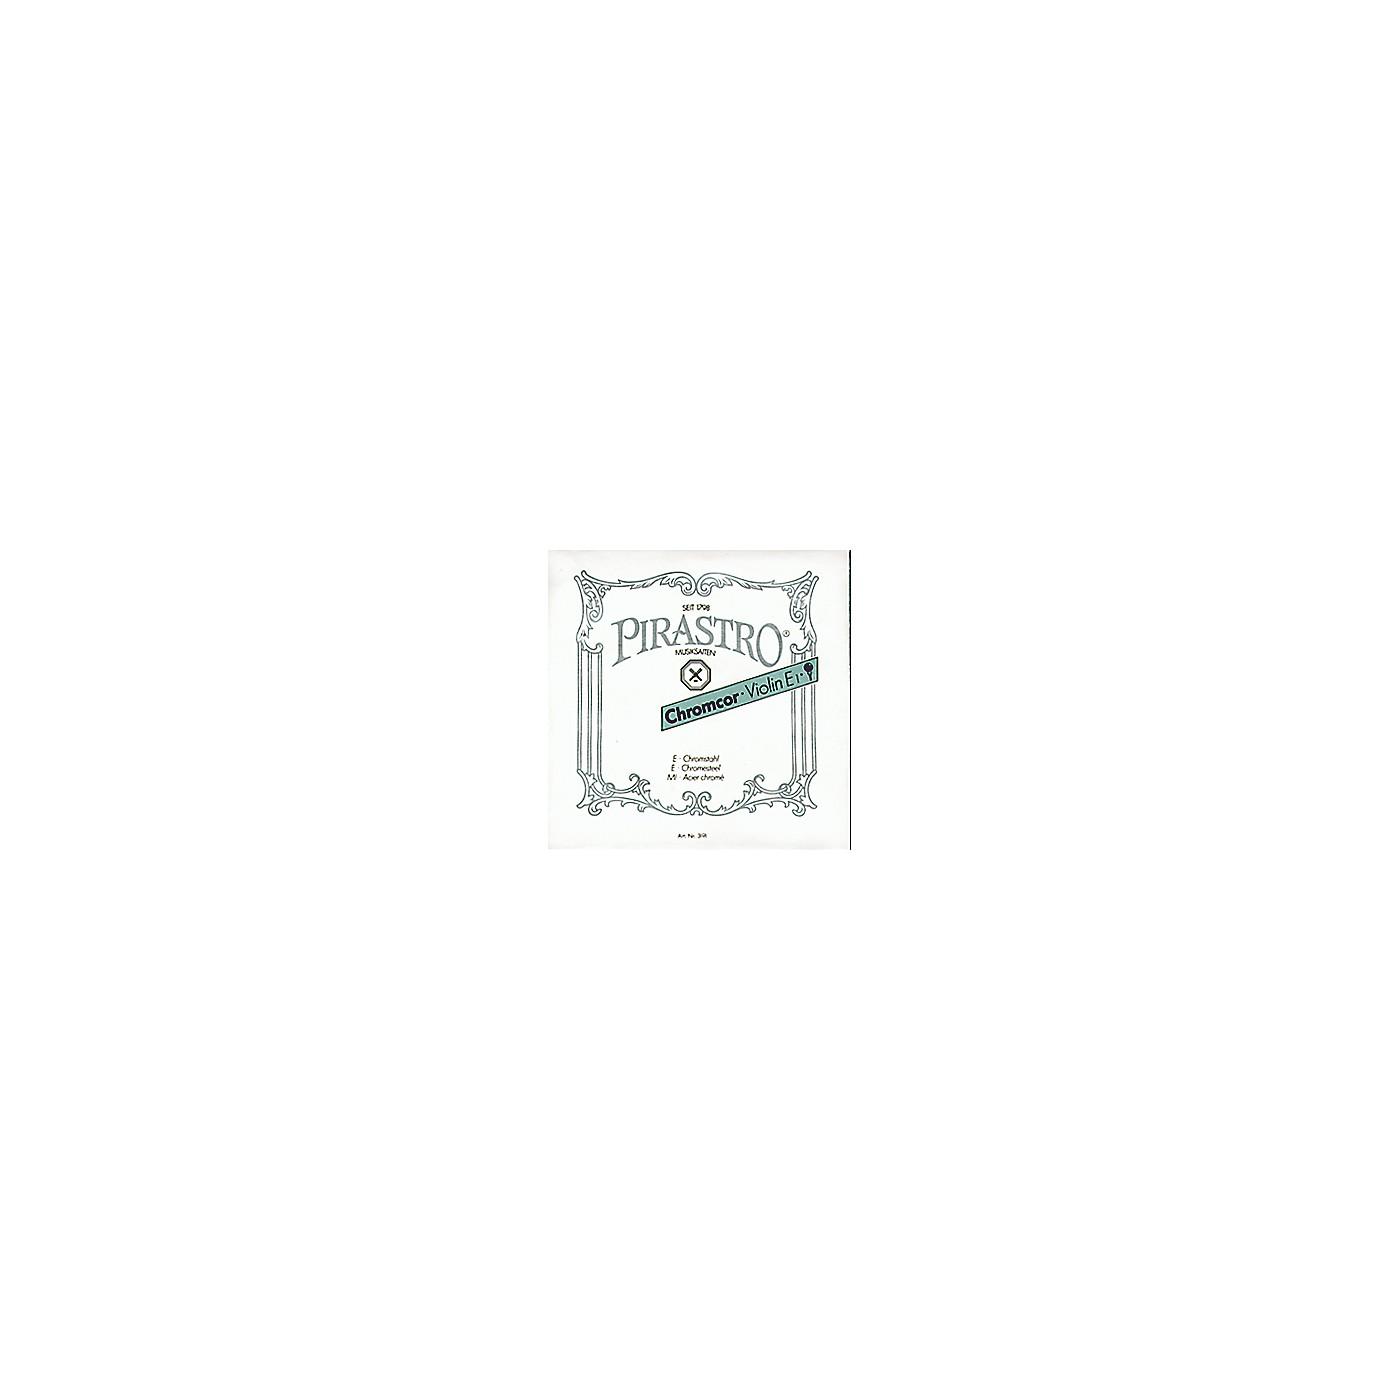 Pirastro Chromcor Series Violin String Set thumbnail